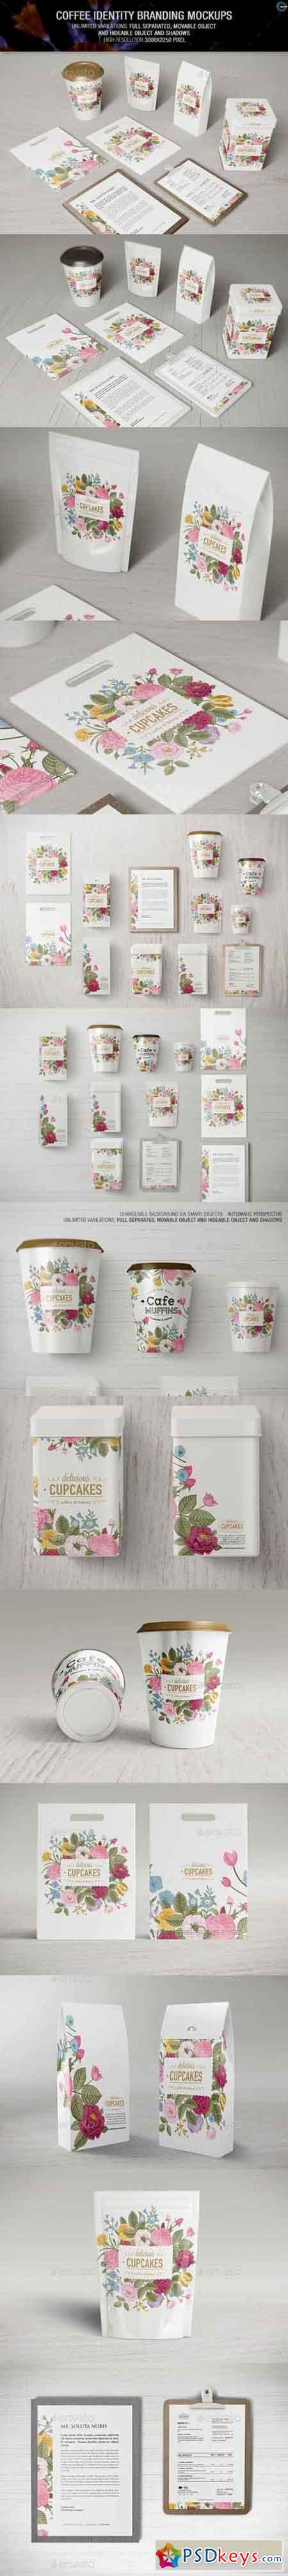 Coffee Identity Branding Mockups 11096078